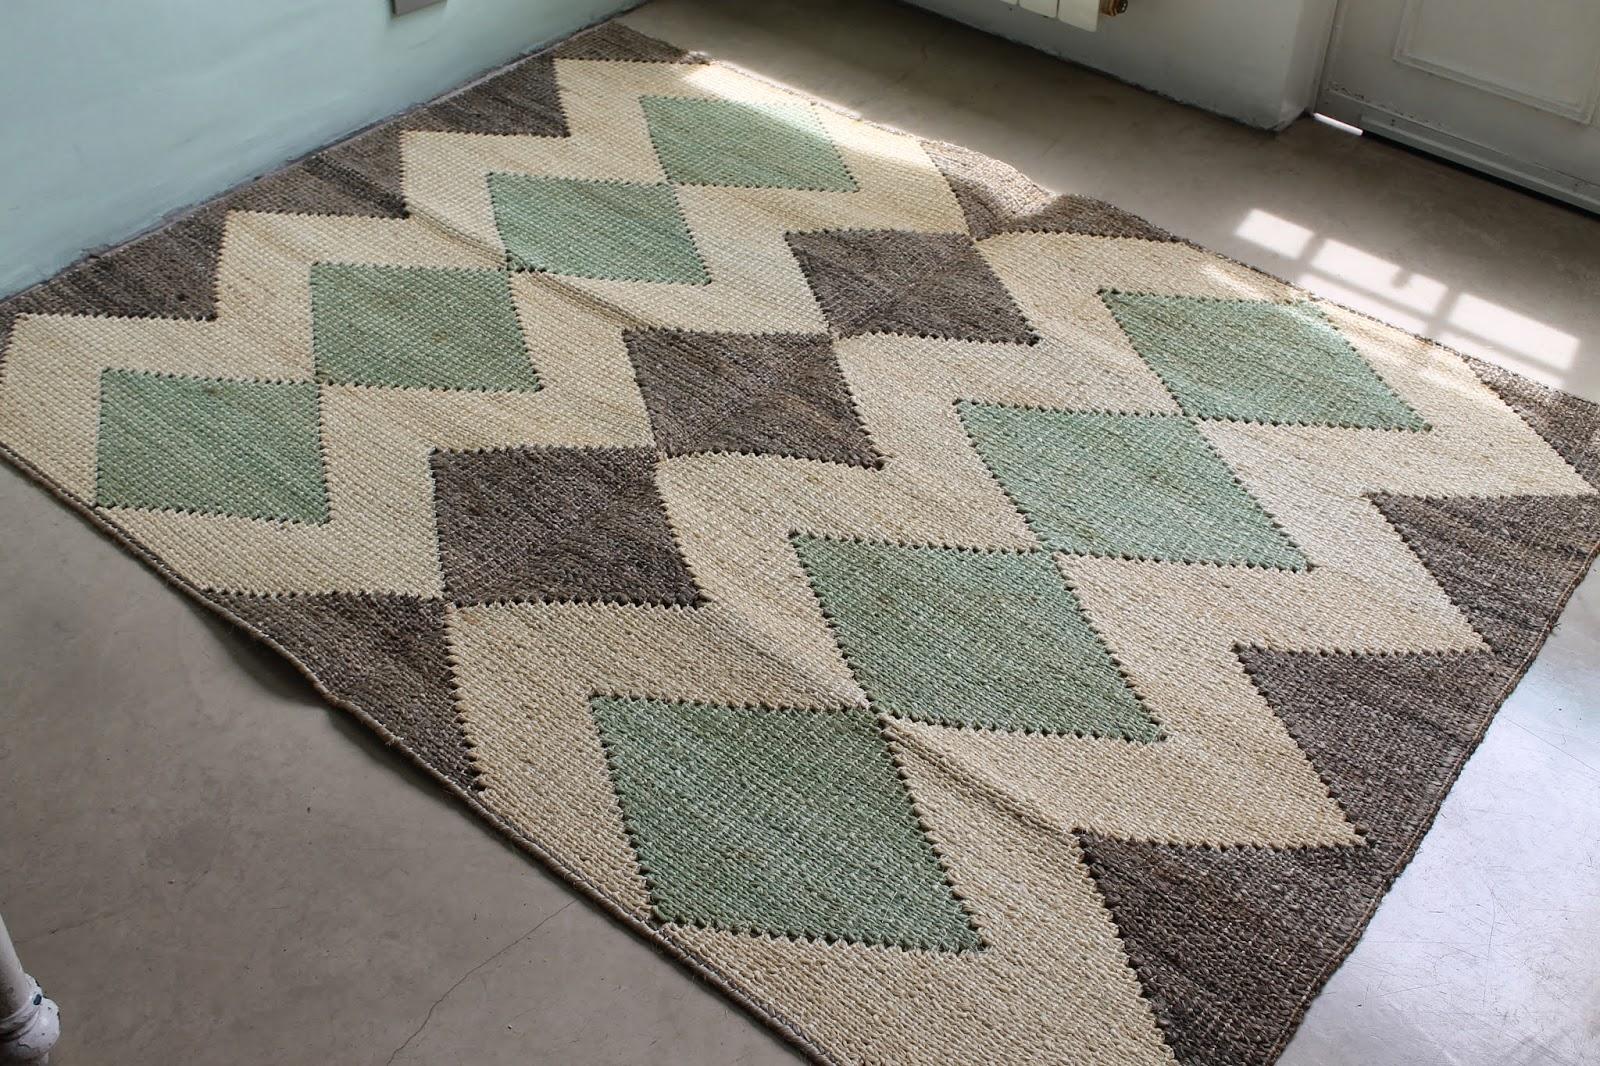 Alfombras deco marce for Alfombras carpetas modernas